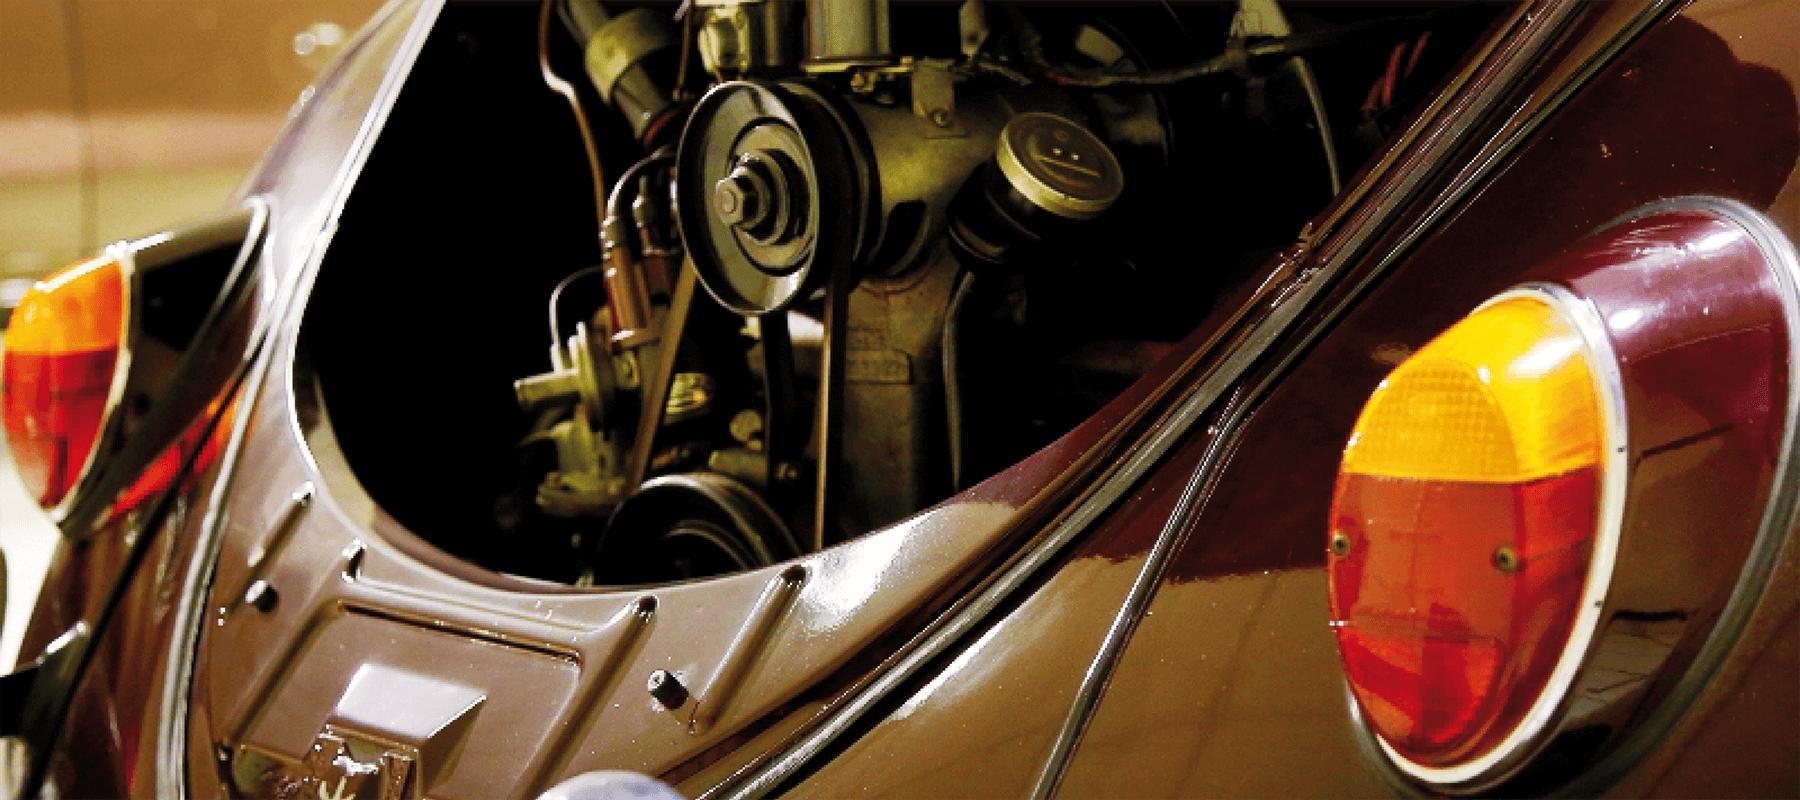 classic-part-beetle-startseite-1800x800